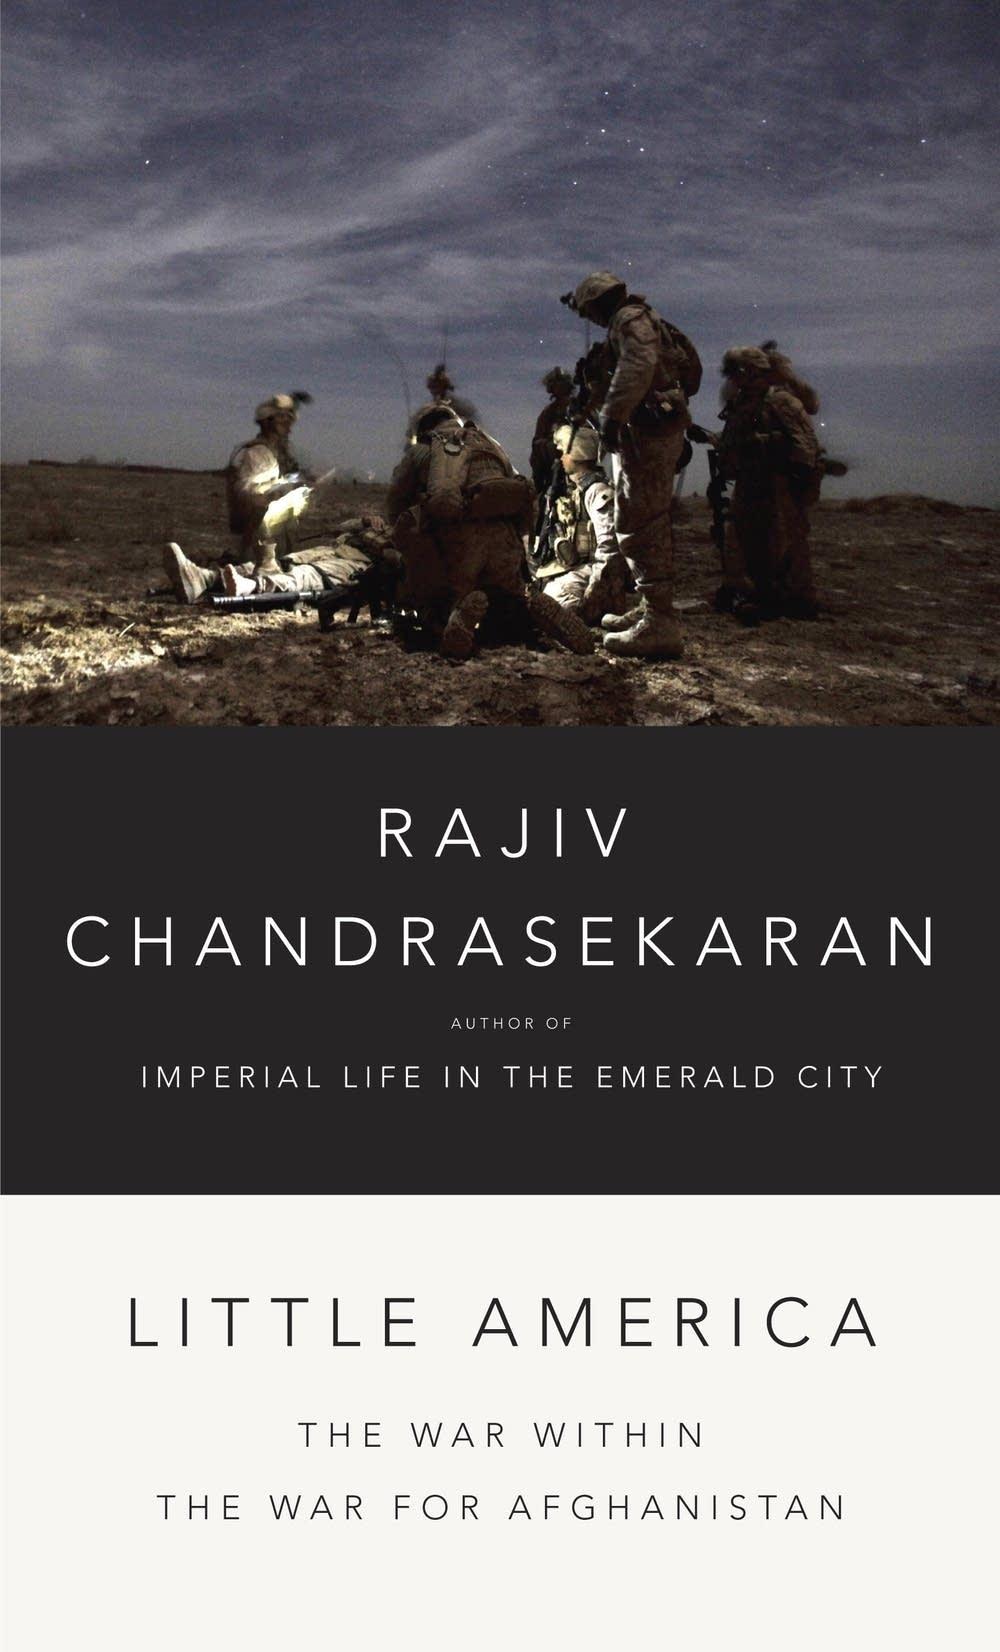 'Little America' by Rajiv Chandrasekaran